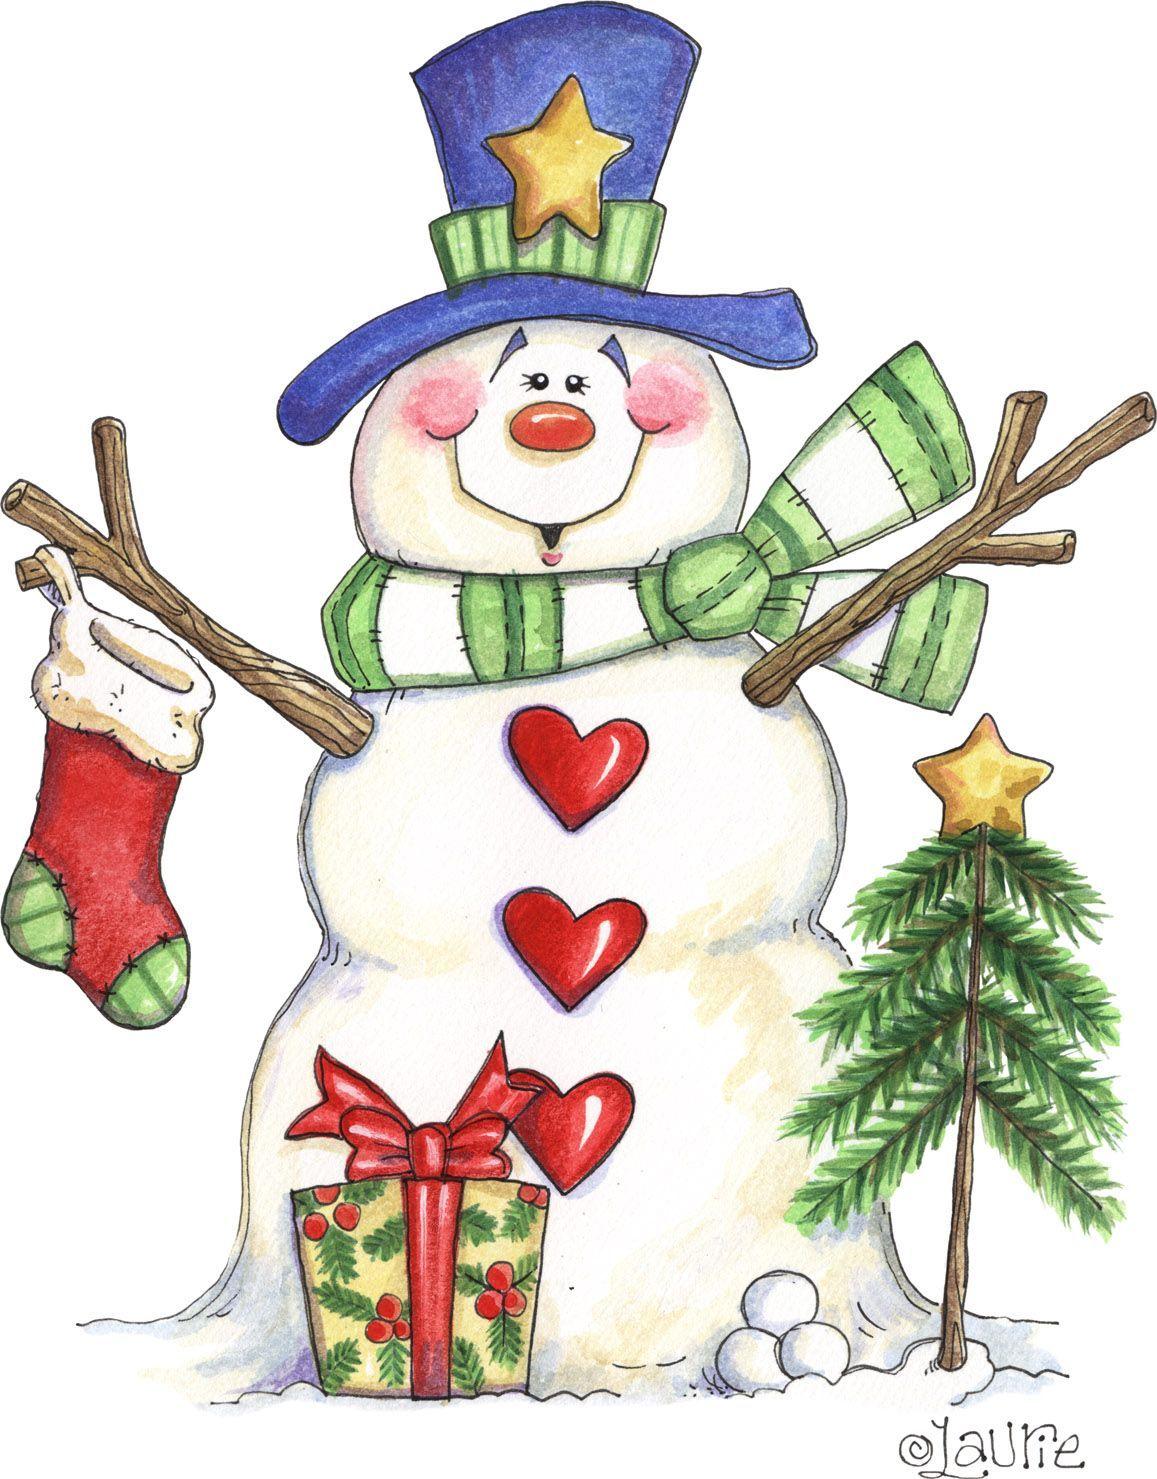 ilustraciones navide as snowman snowman clipart and christmas rh pinterest com christmas snowman border clipart christmas snowman border clipart